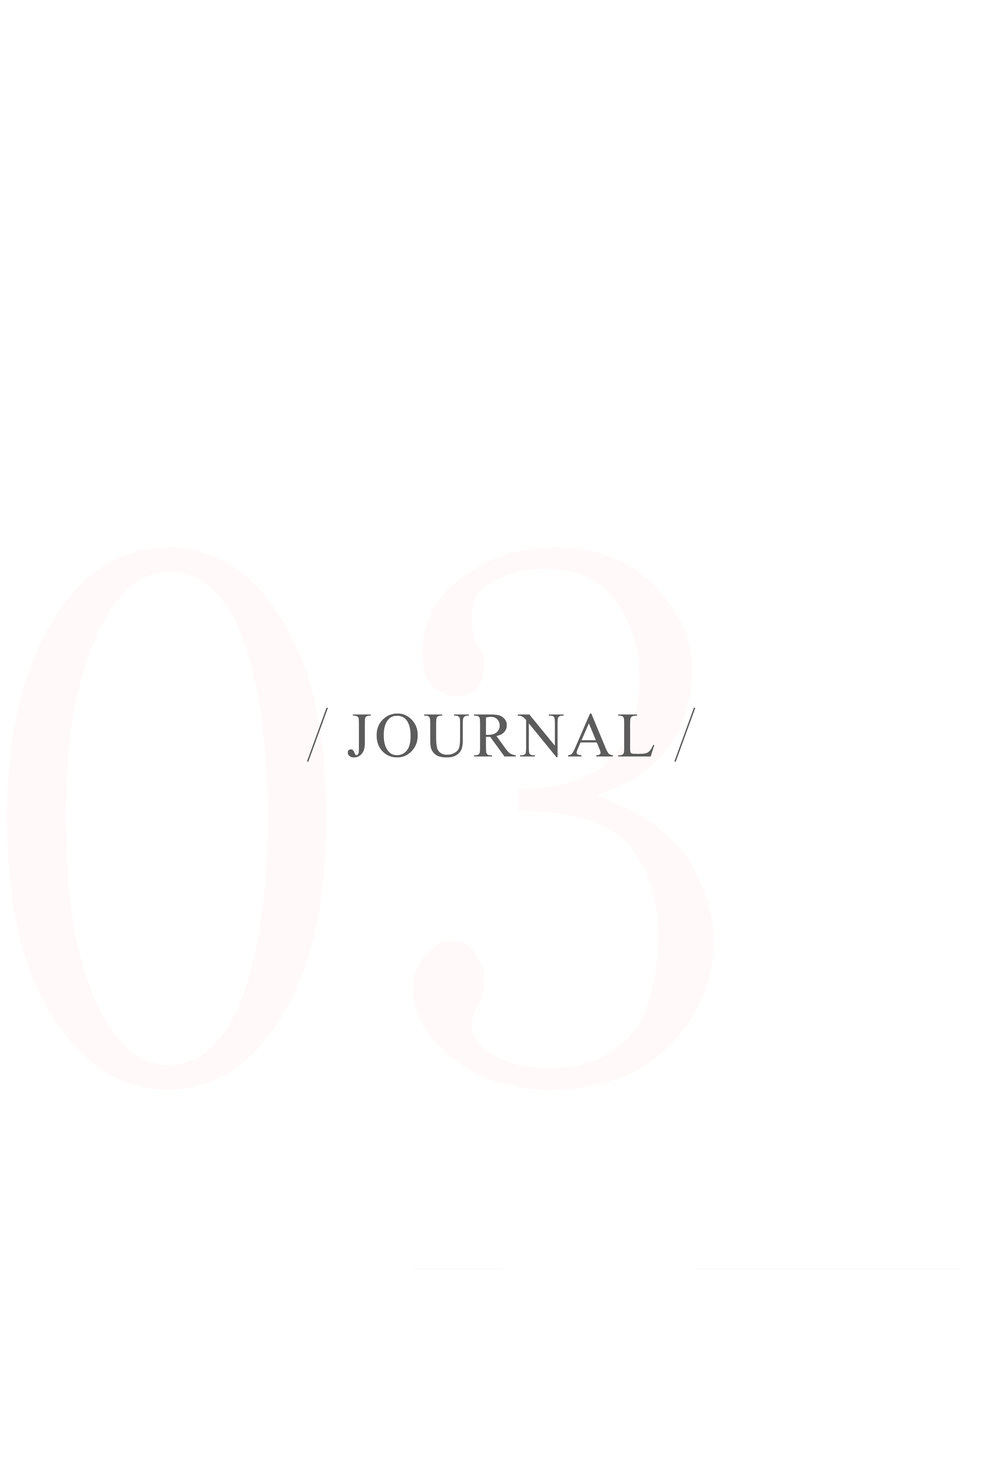 JOURNAL PINK 3.jpg